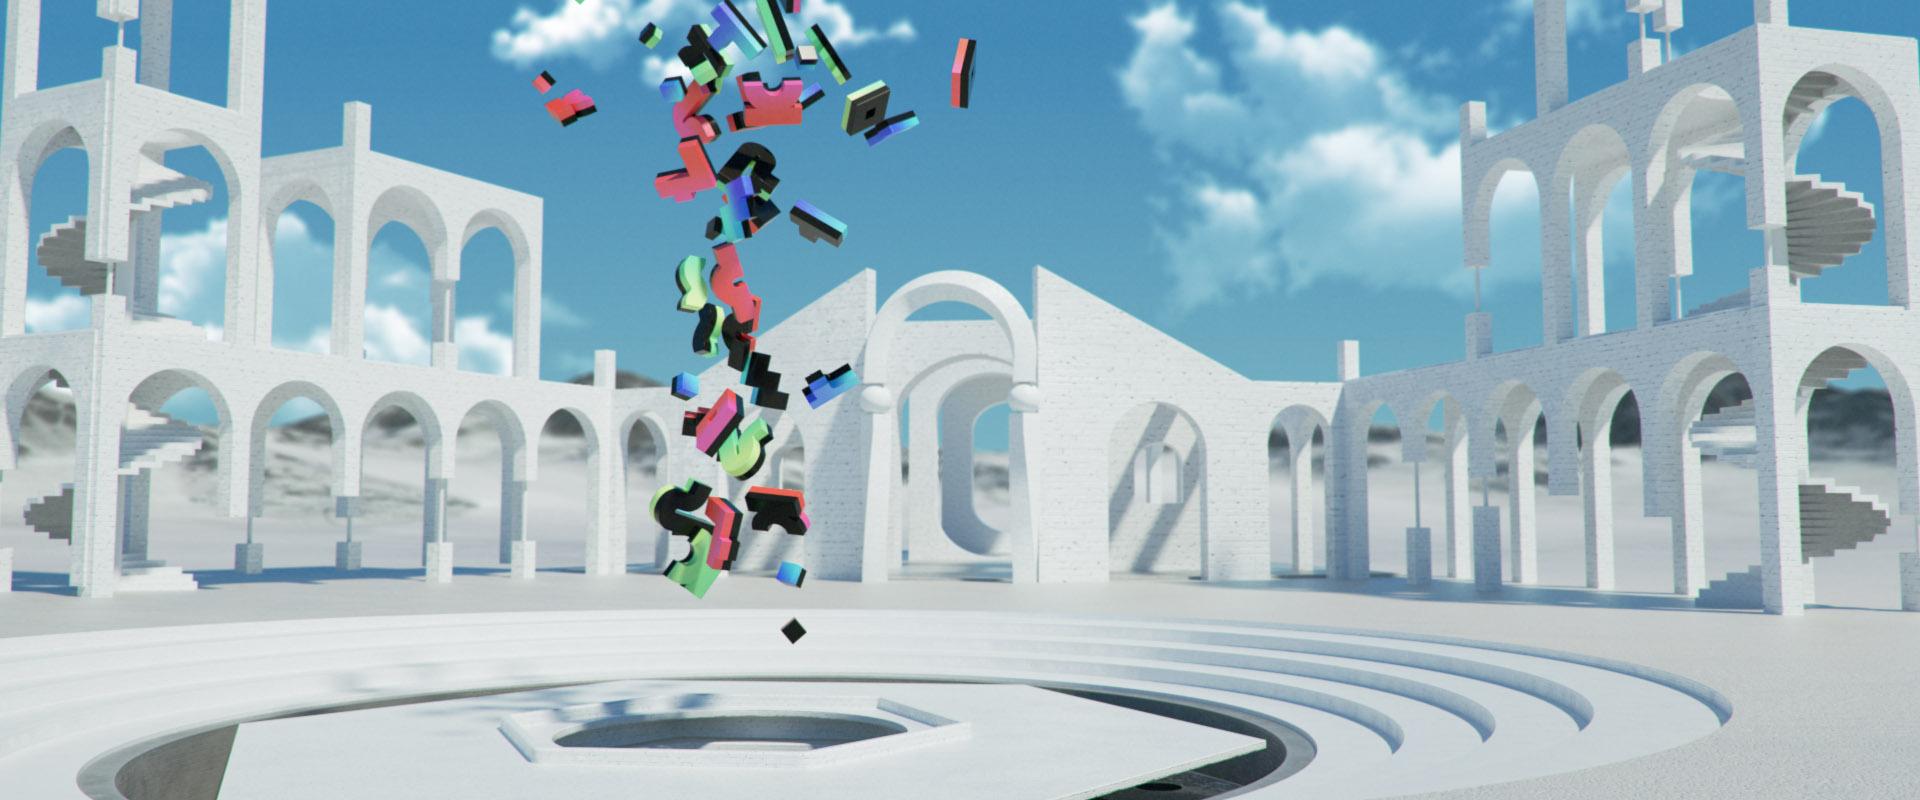 BRIEF_FESTIVAL_11 copy.jpg